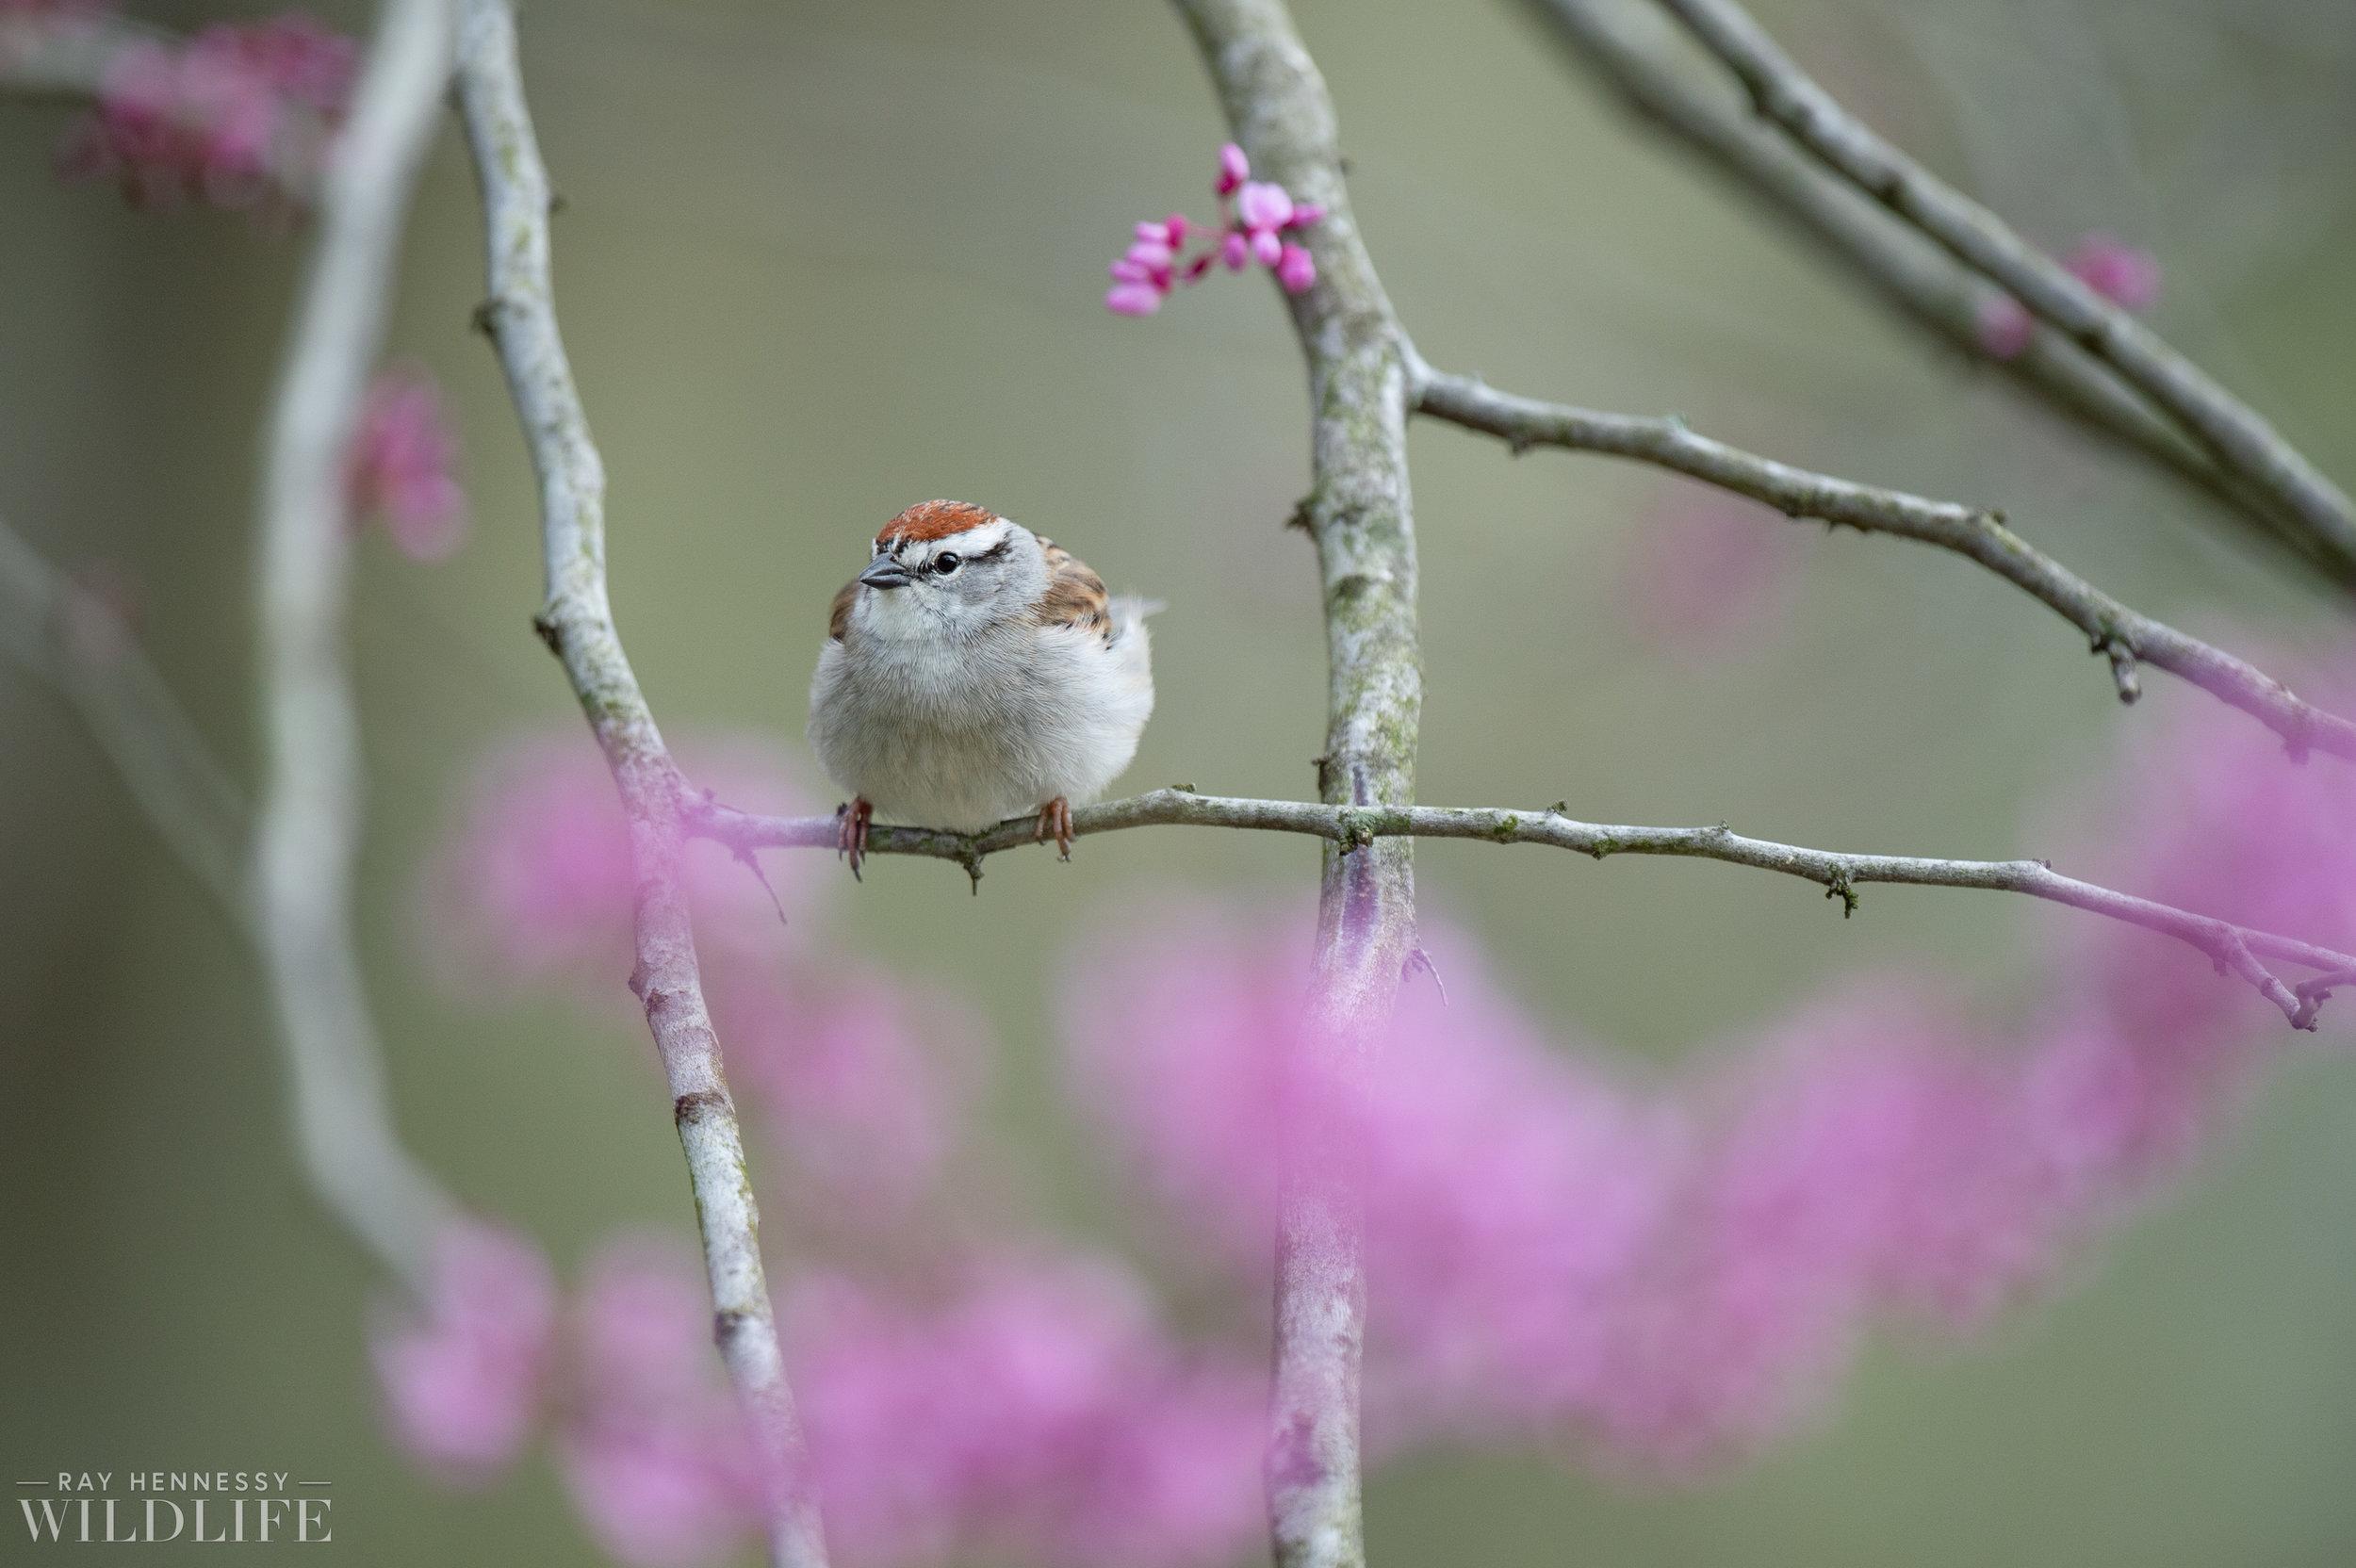 020_spring-warblers-new-jersey.jpg